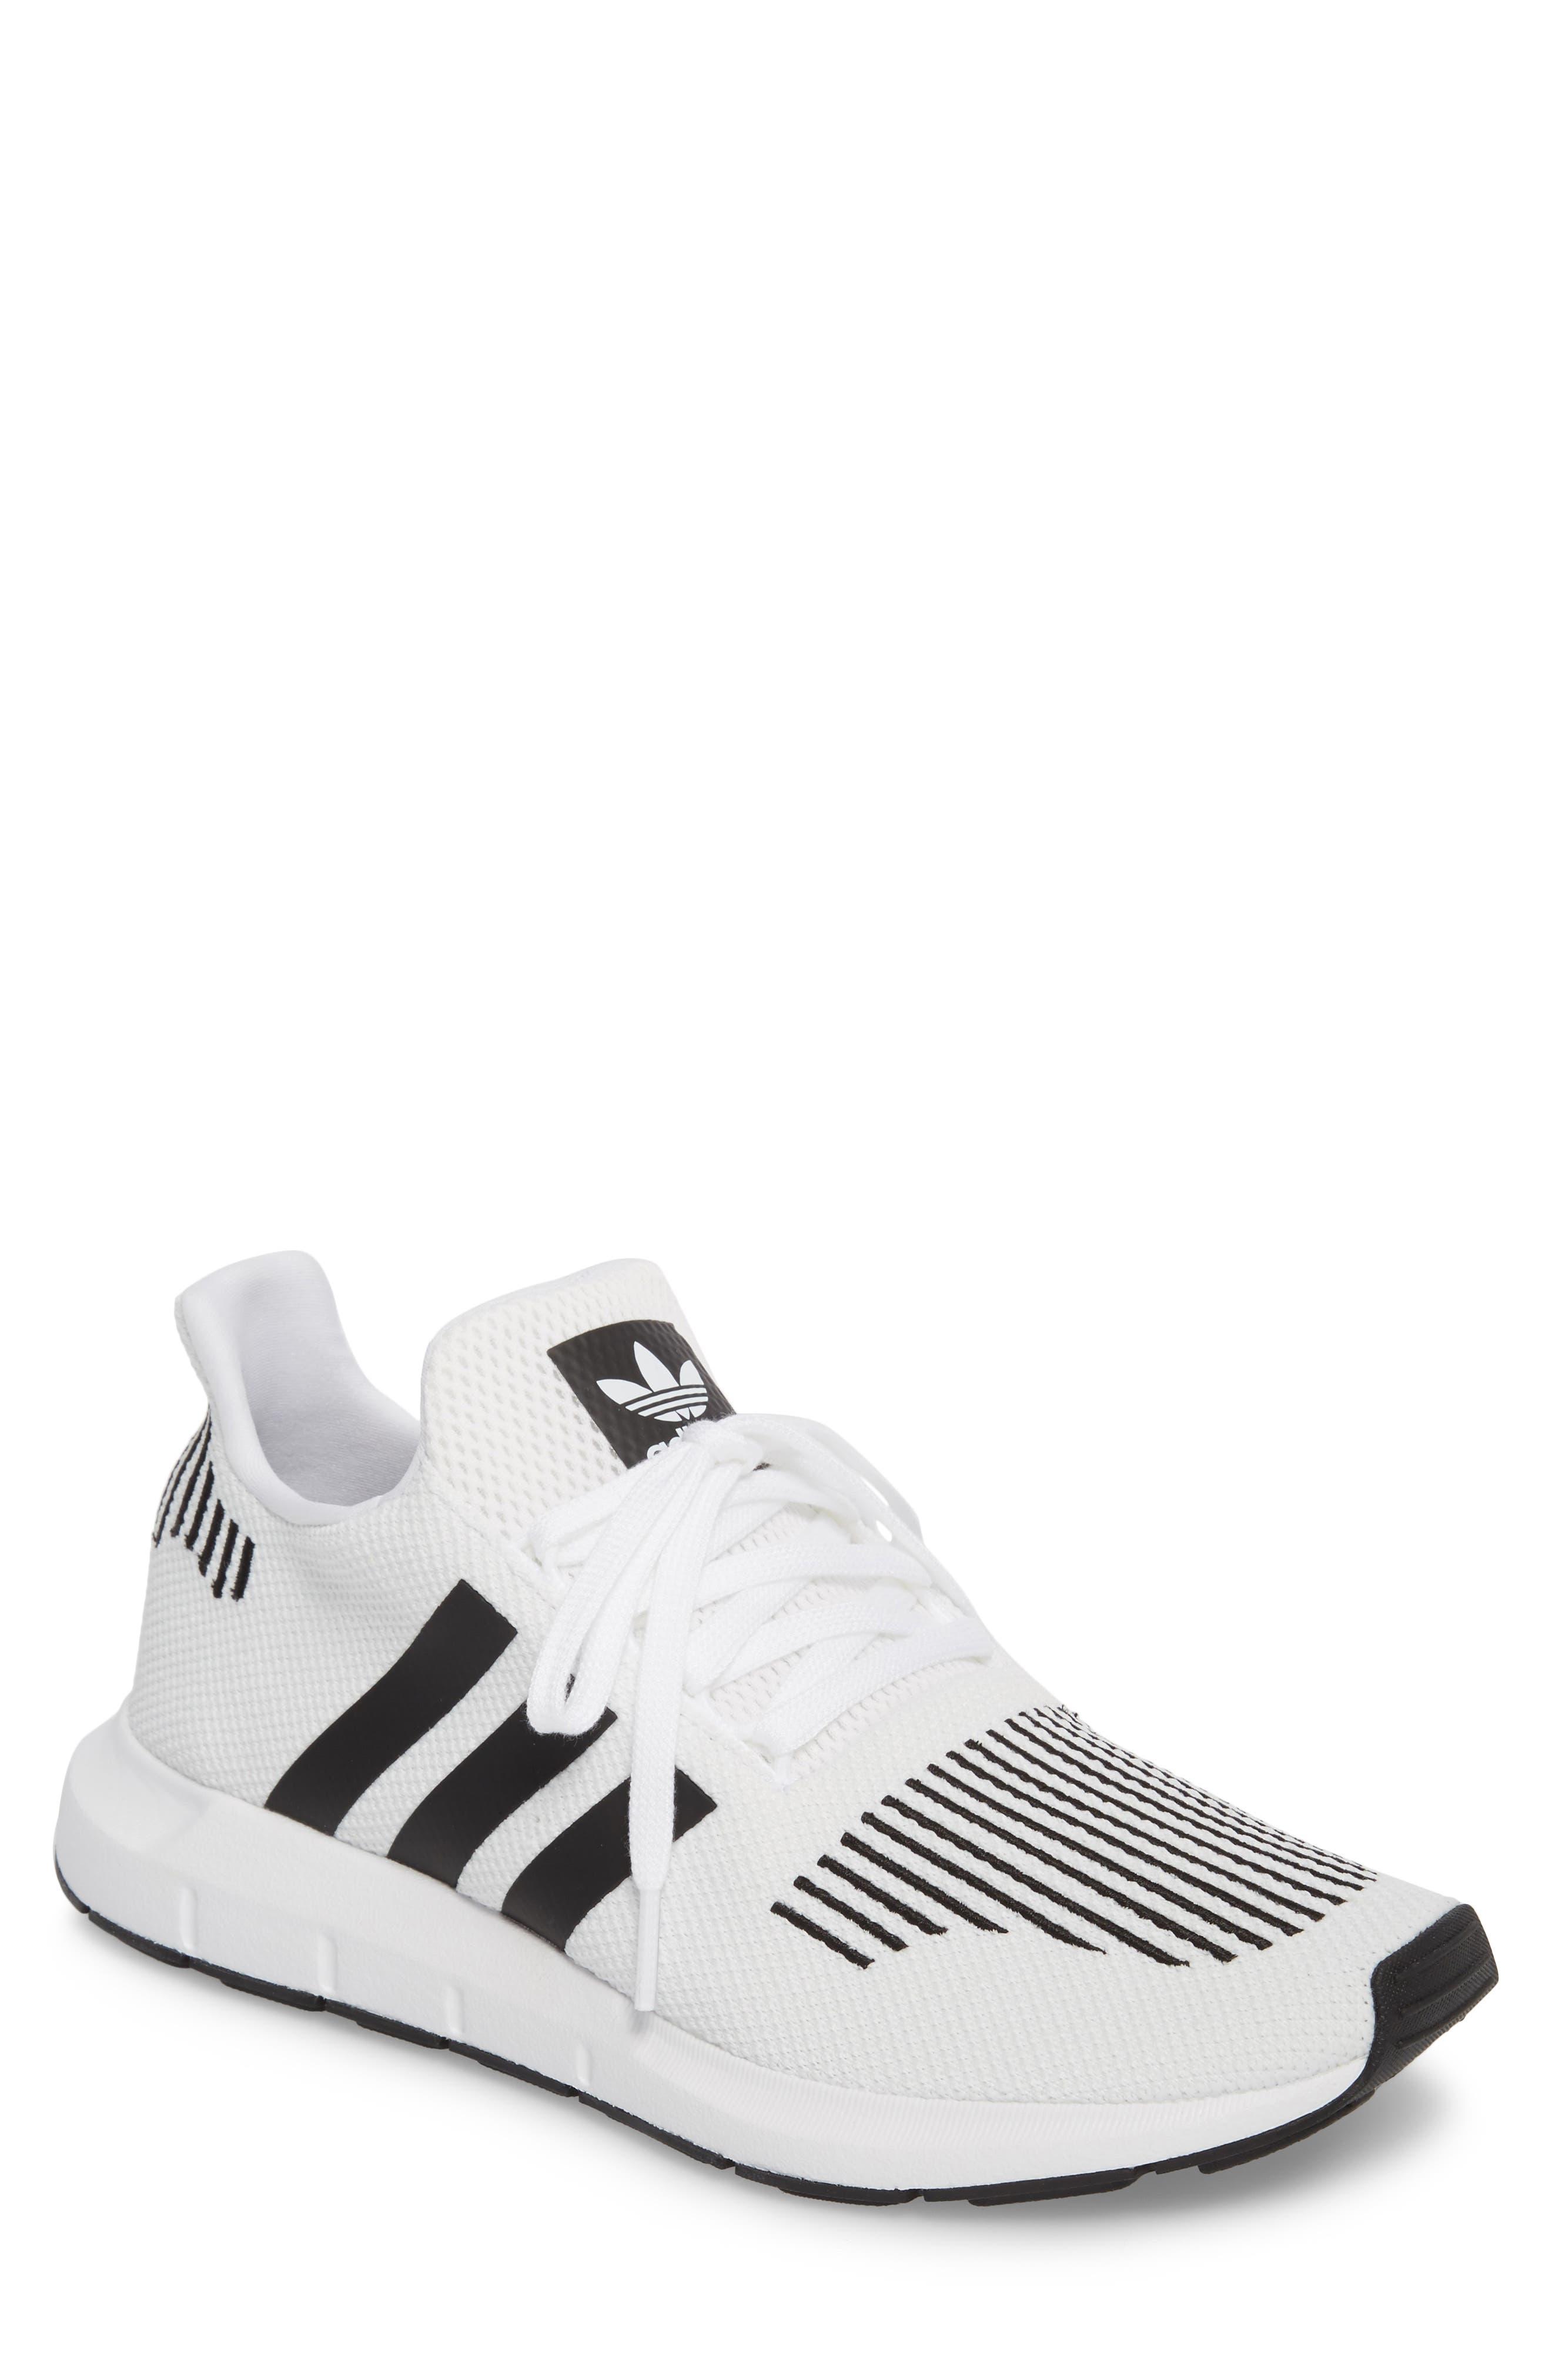 Alternate Image 1 Selected - adidas Swift Run Sneaker (Men)